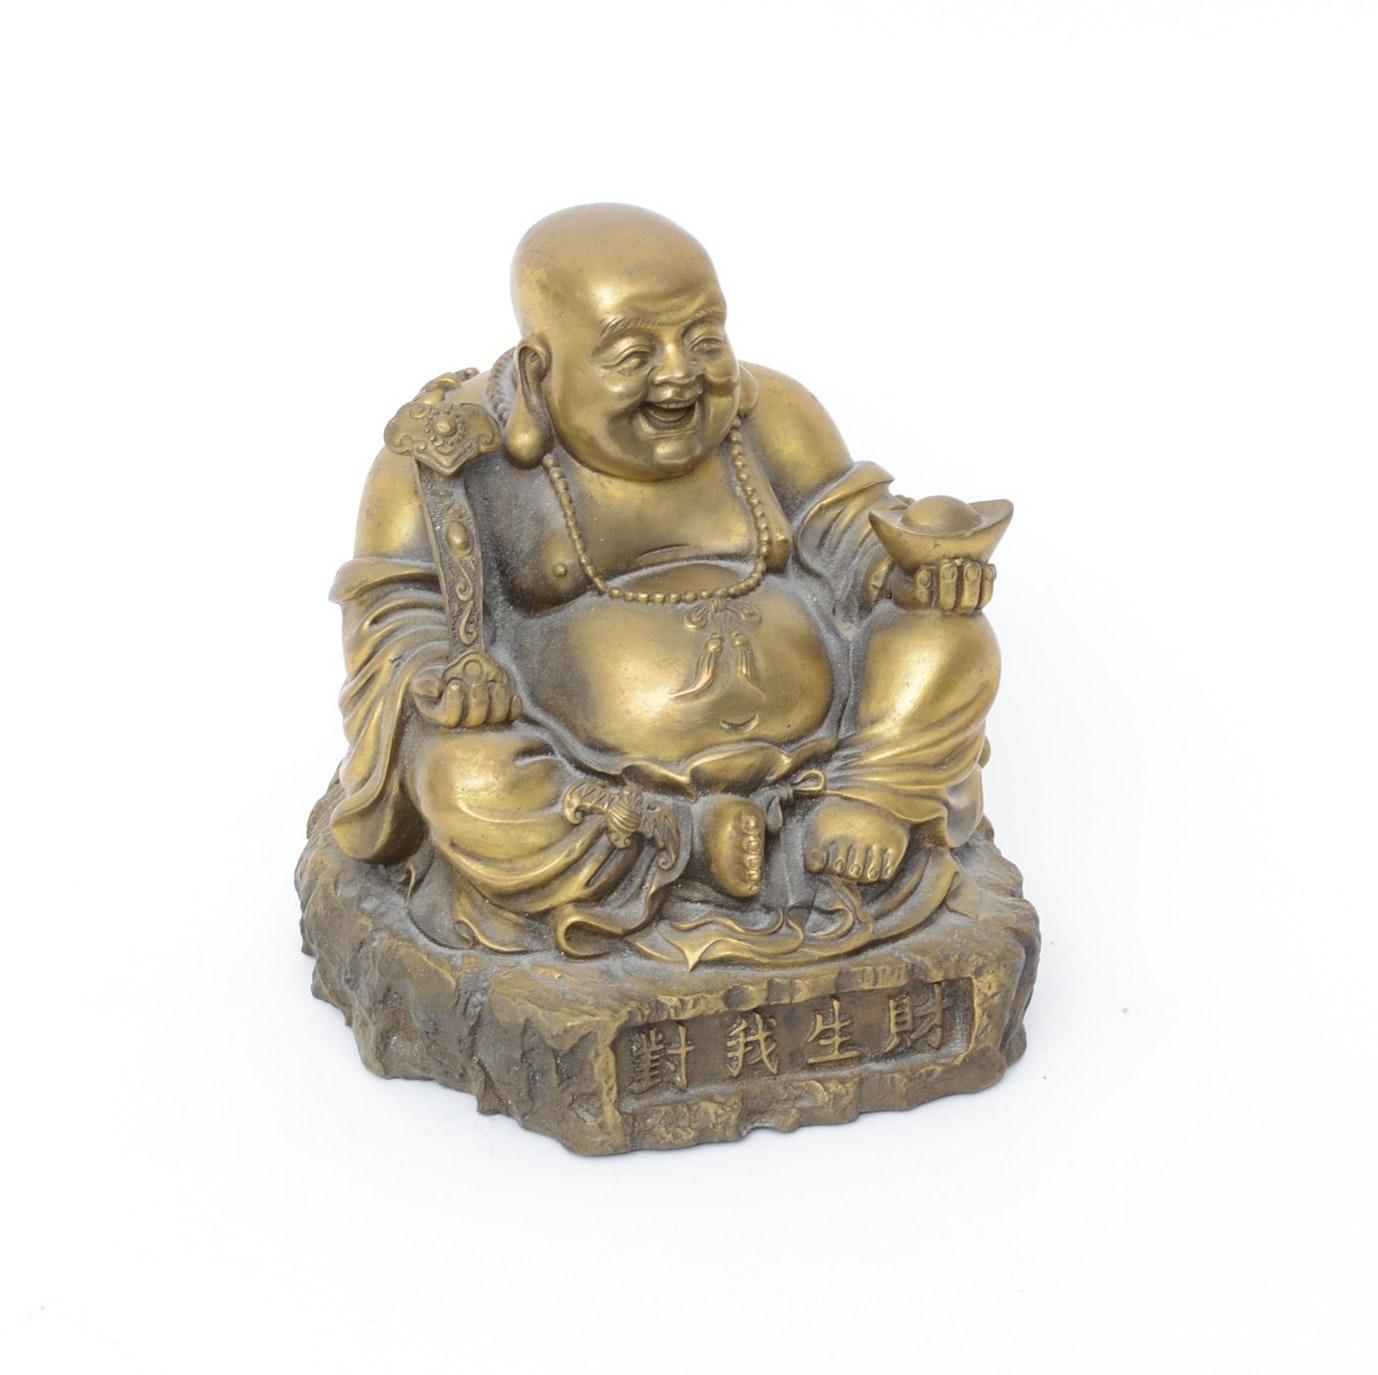 Chinese Cast Brass Budai Figurine